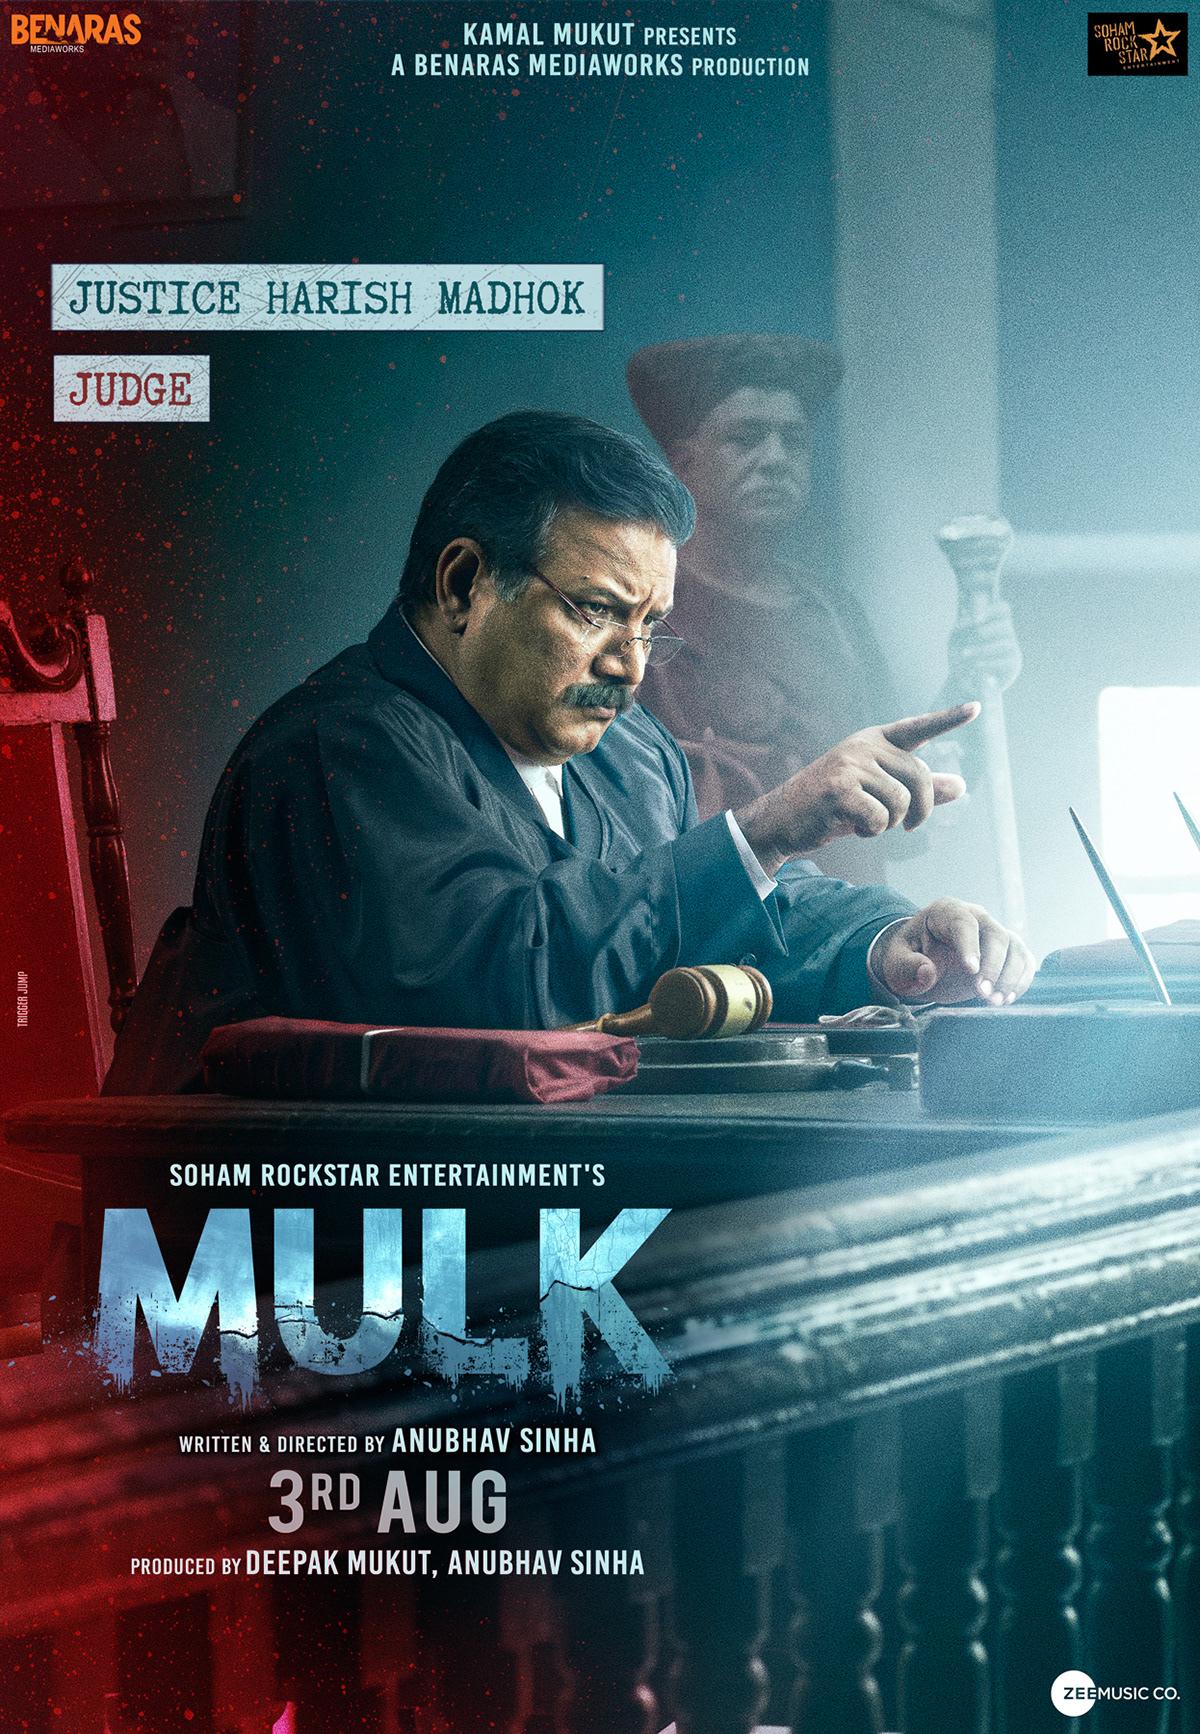 MULK (2018) RISHI KAPOOR + Jukebox + Sub. Español 5c562e68422027.5b5c4c801b4a4